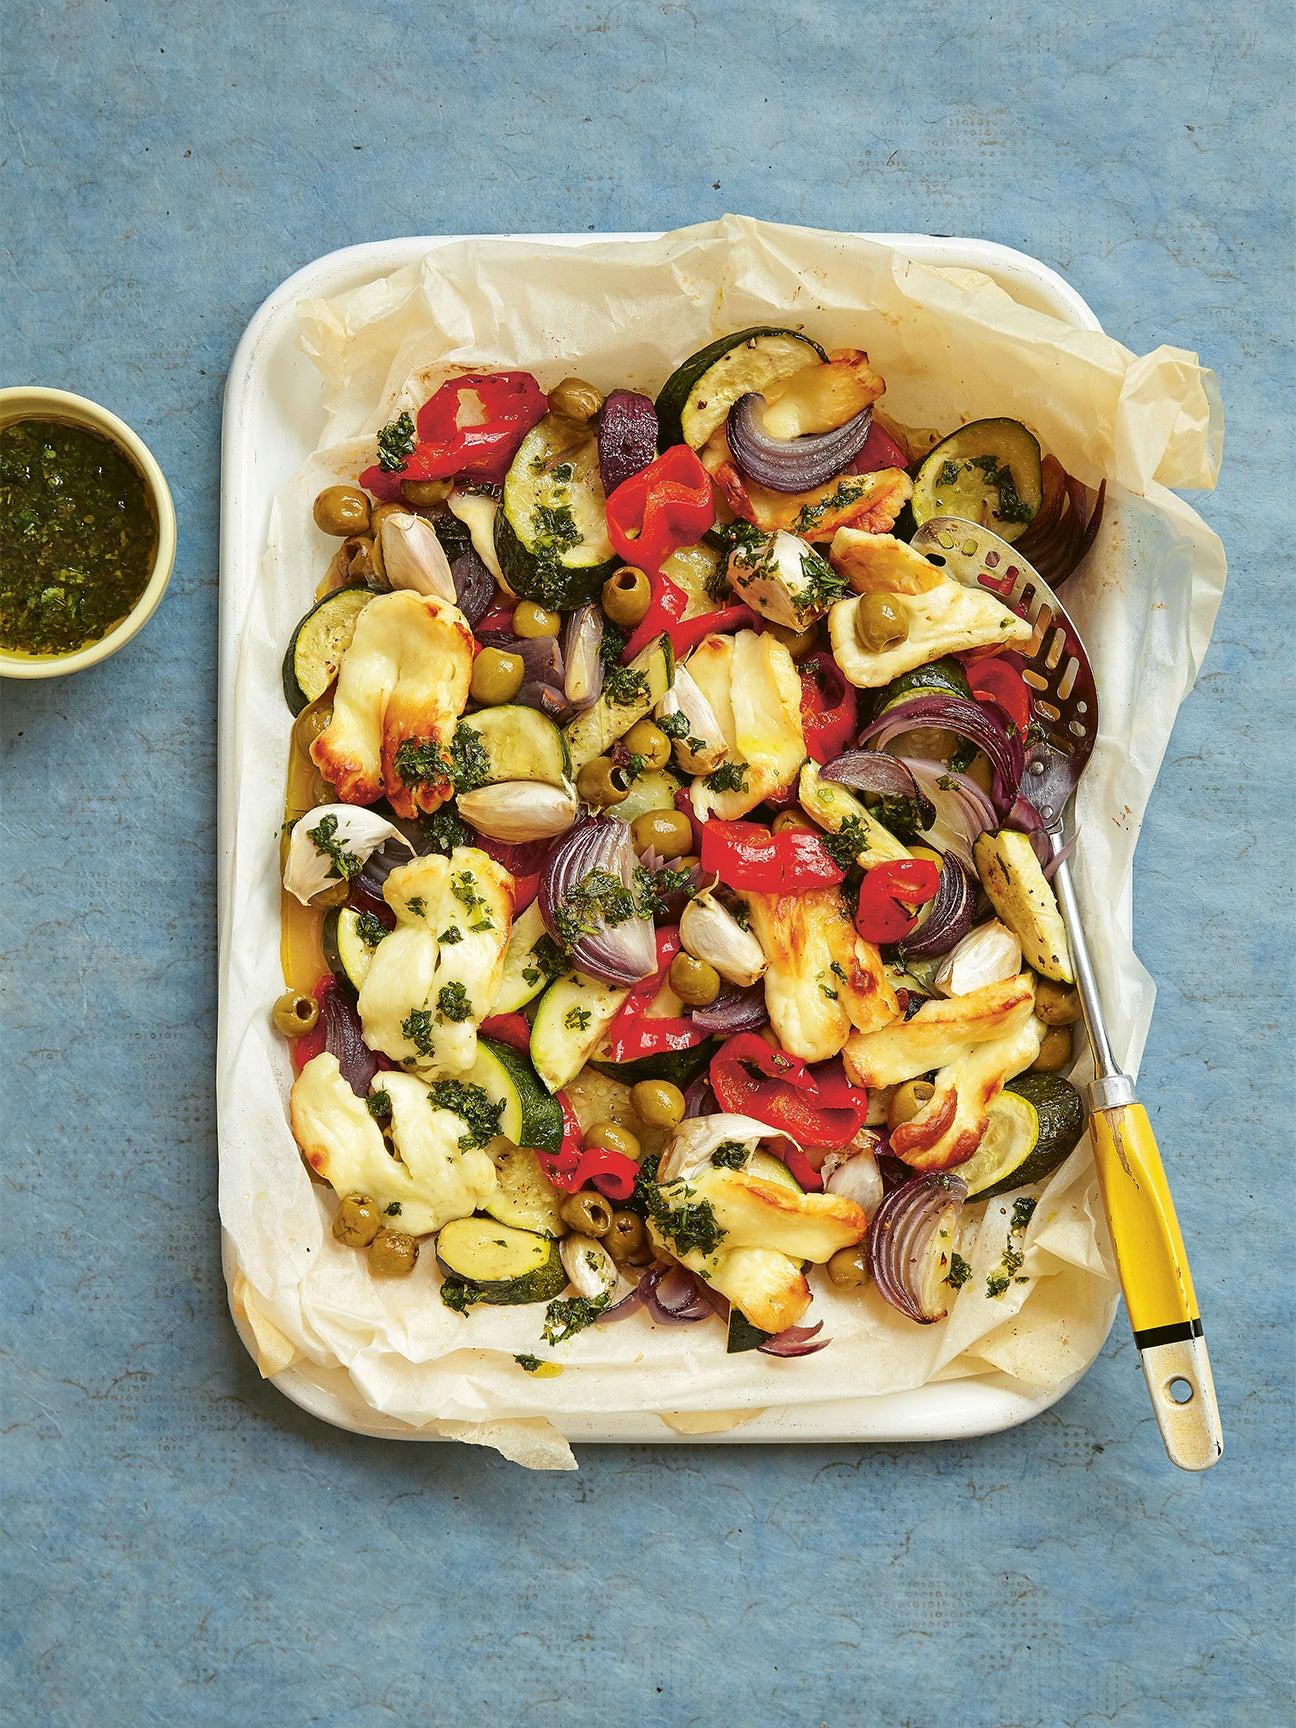 00-FEATURE-bag-dinner-recipes-domino-vegetables-halloumi